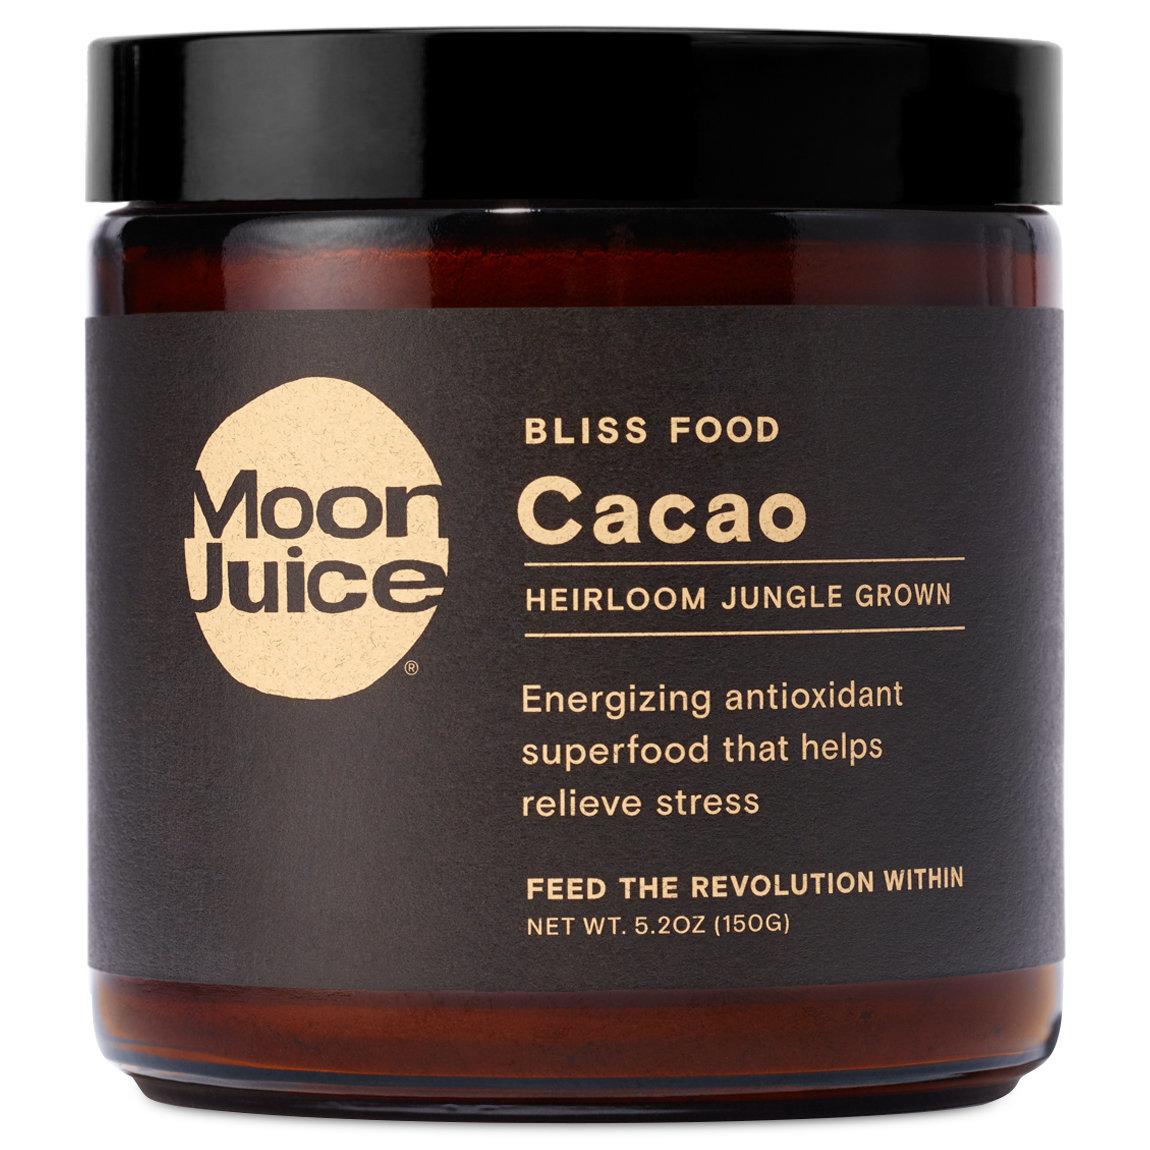 Moon Juice Cacao alternative view 1.